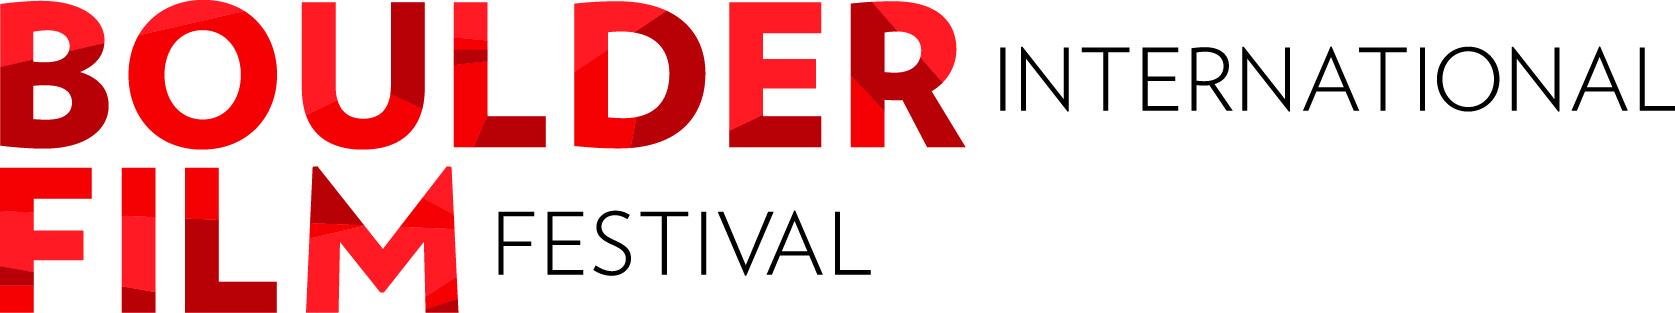 Boulder International Film Festival Logo (text only)